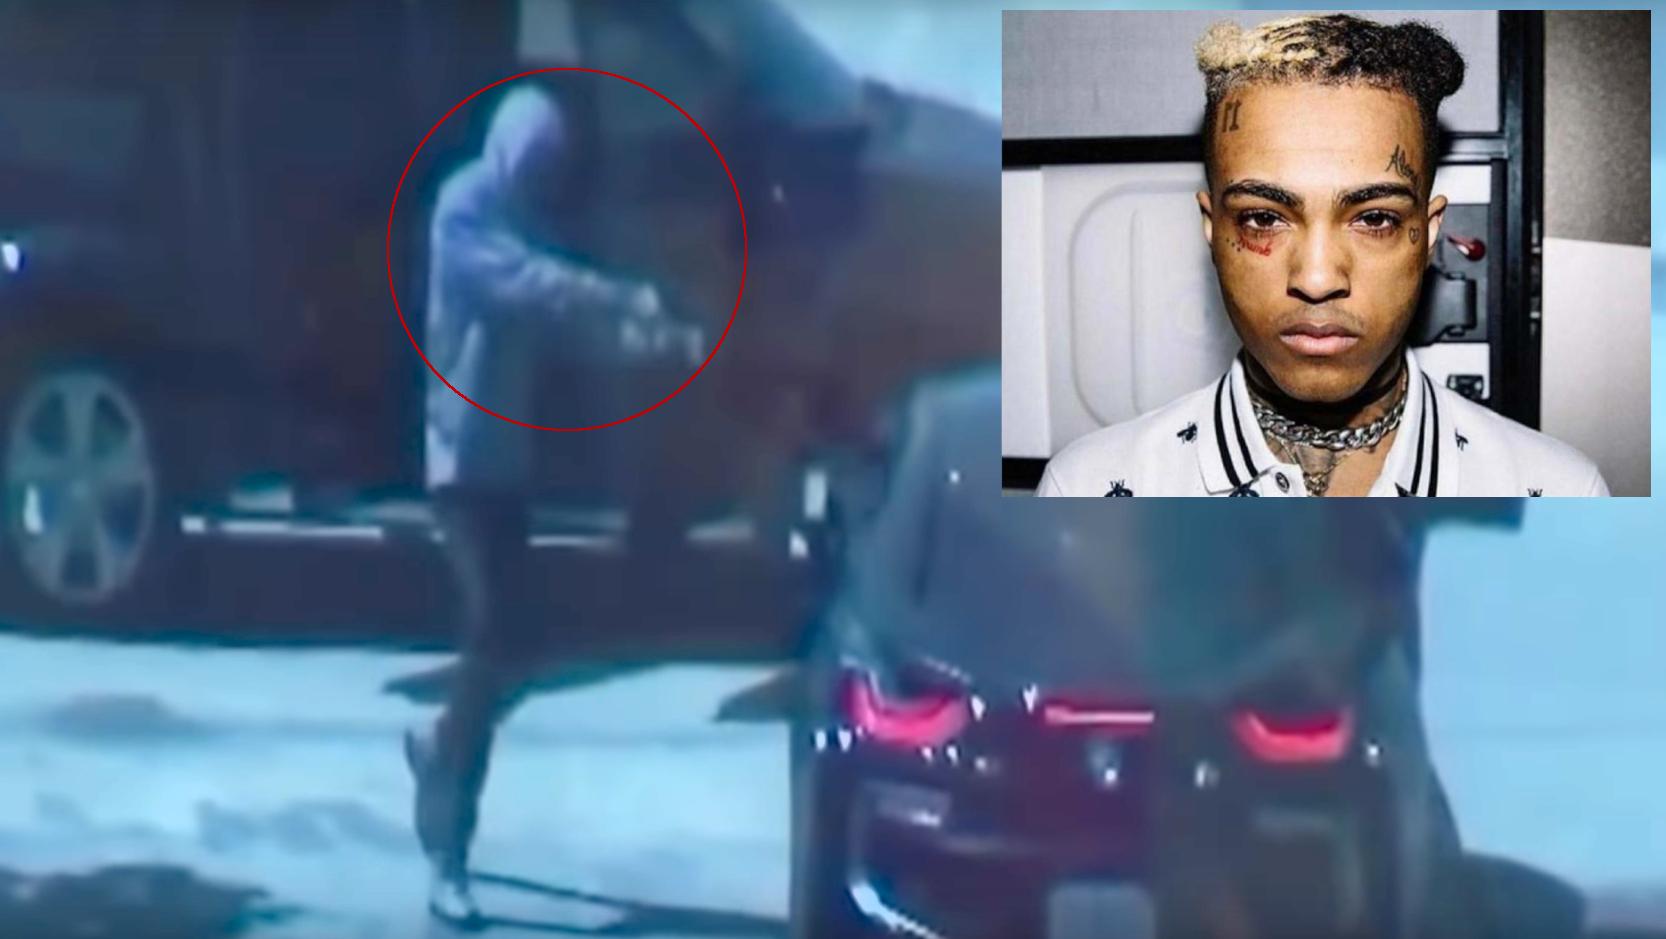 Captan el momento en que mataron al rapero XXXTentacion